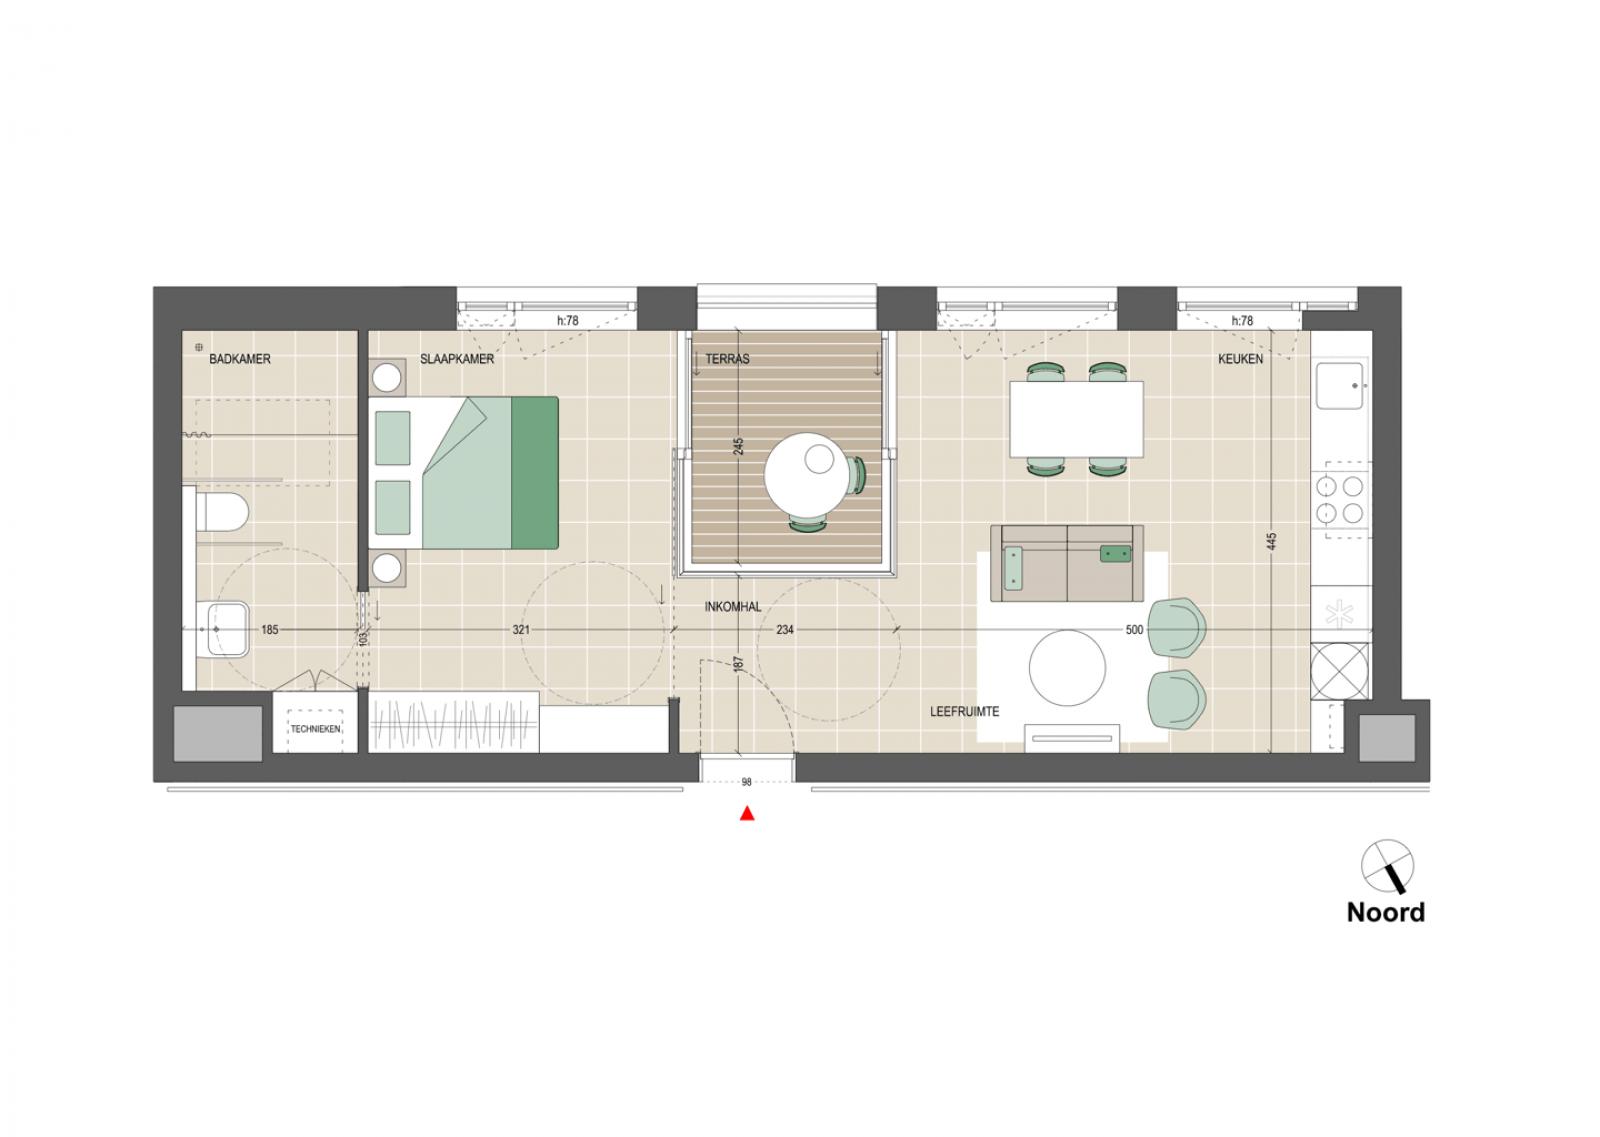 Appartement 1 slaapkamer